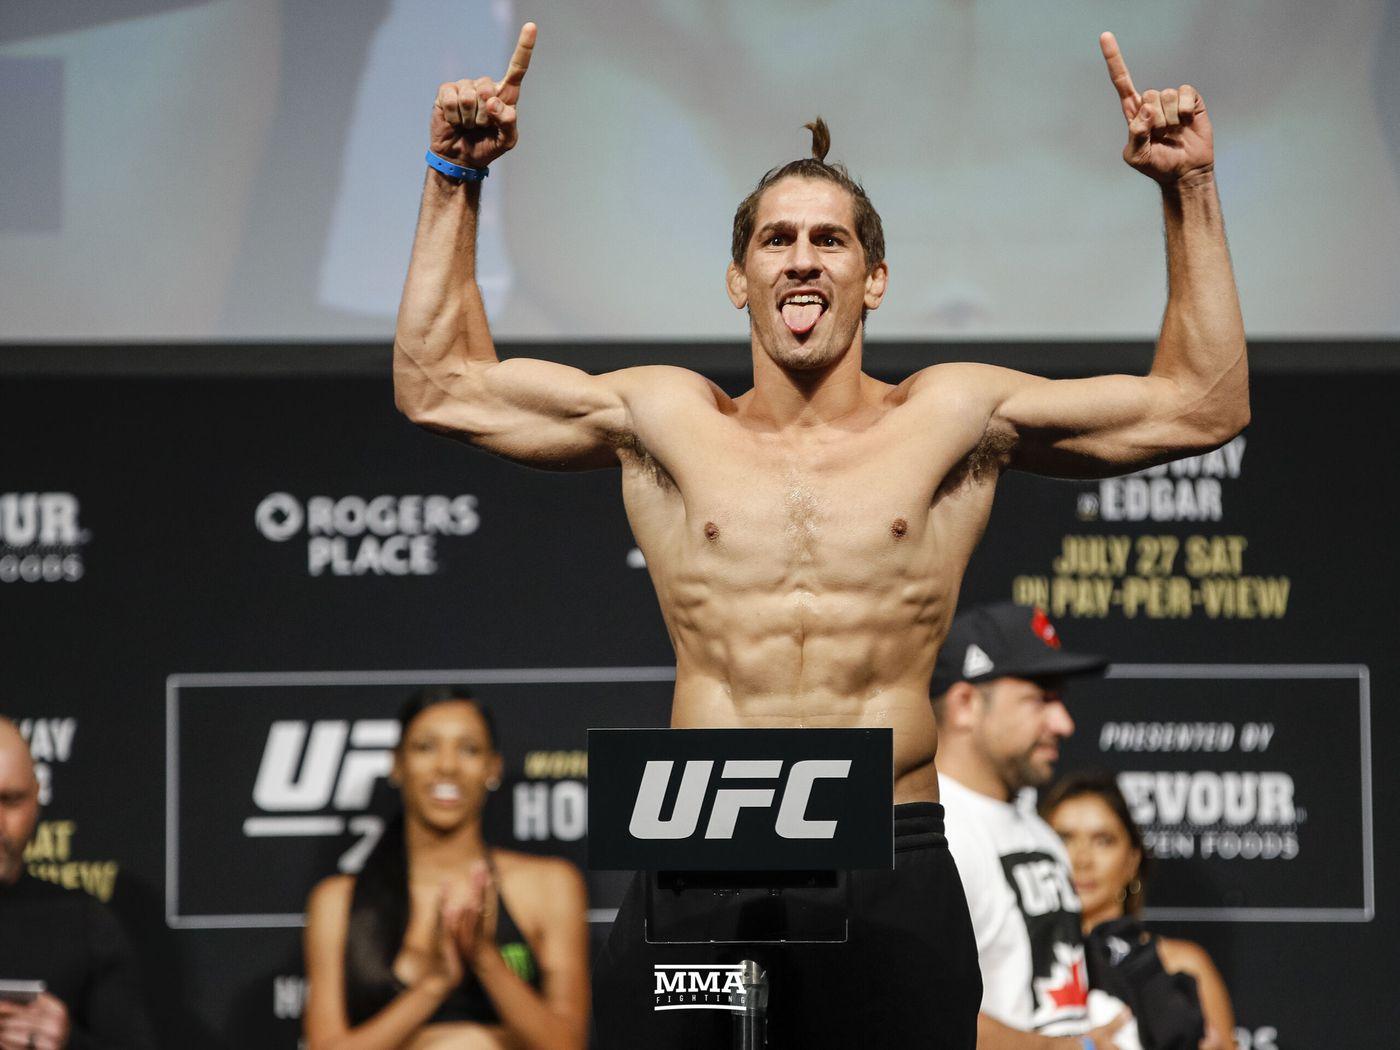 ligeramente Papá alivio  Niko Price announces new 4-fight UFC deal - MMA Fighting